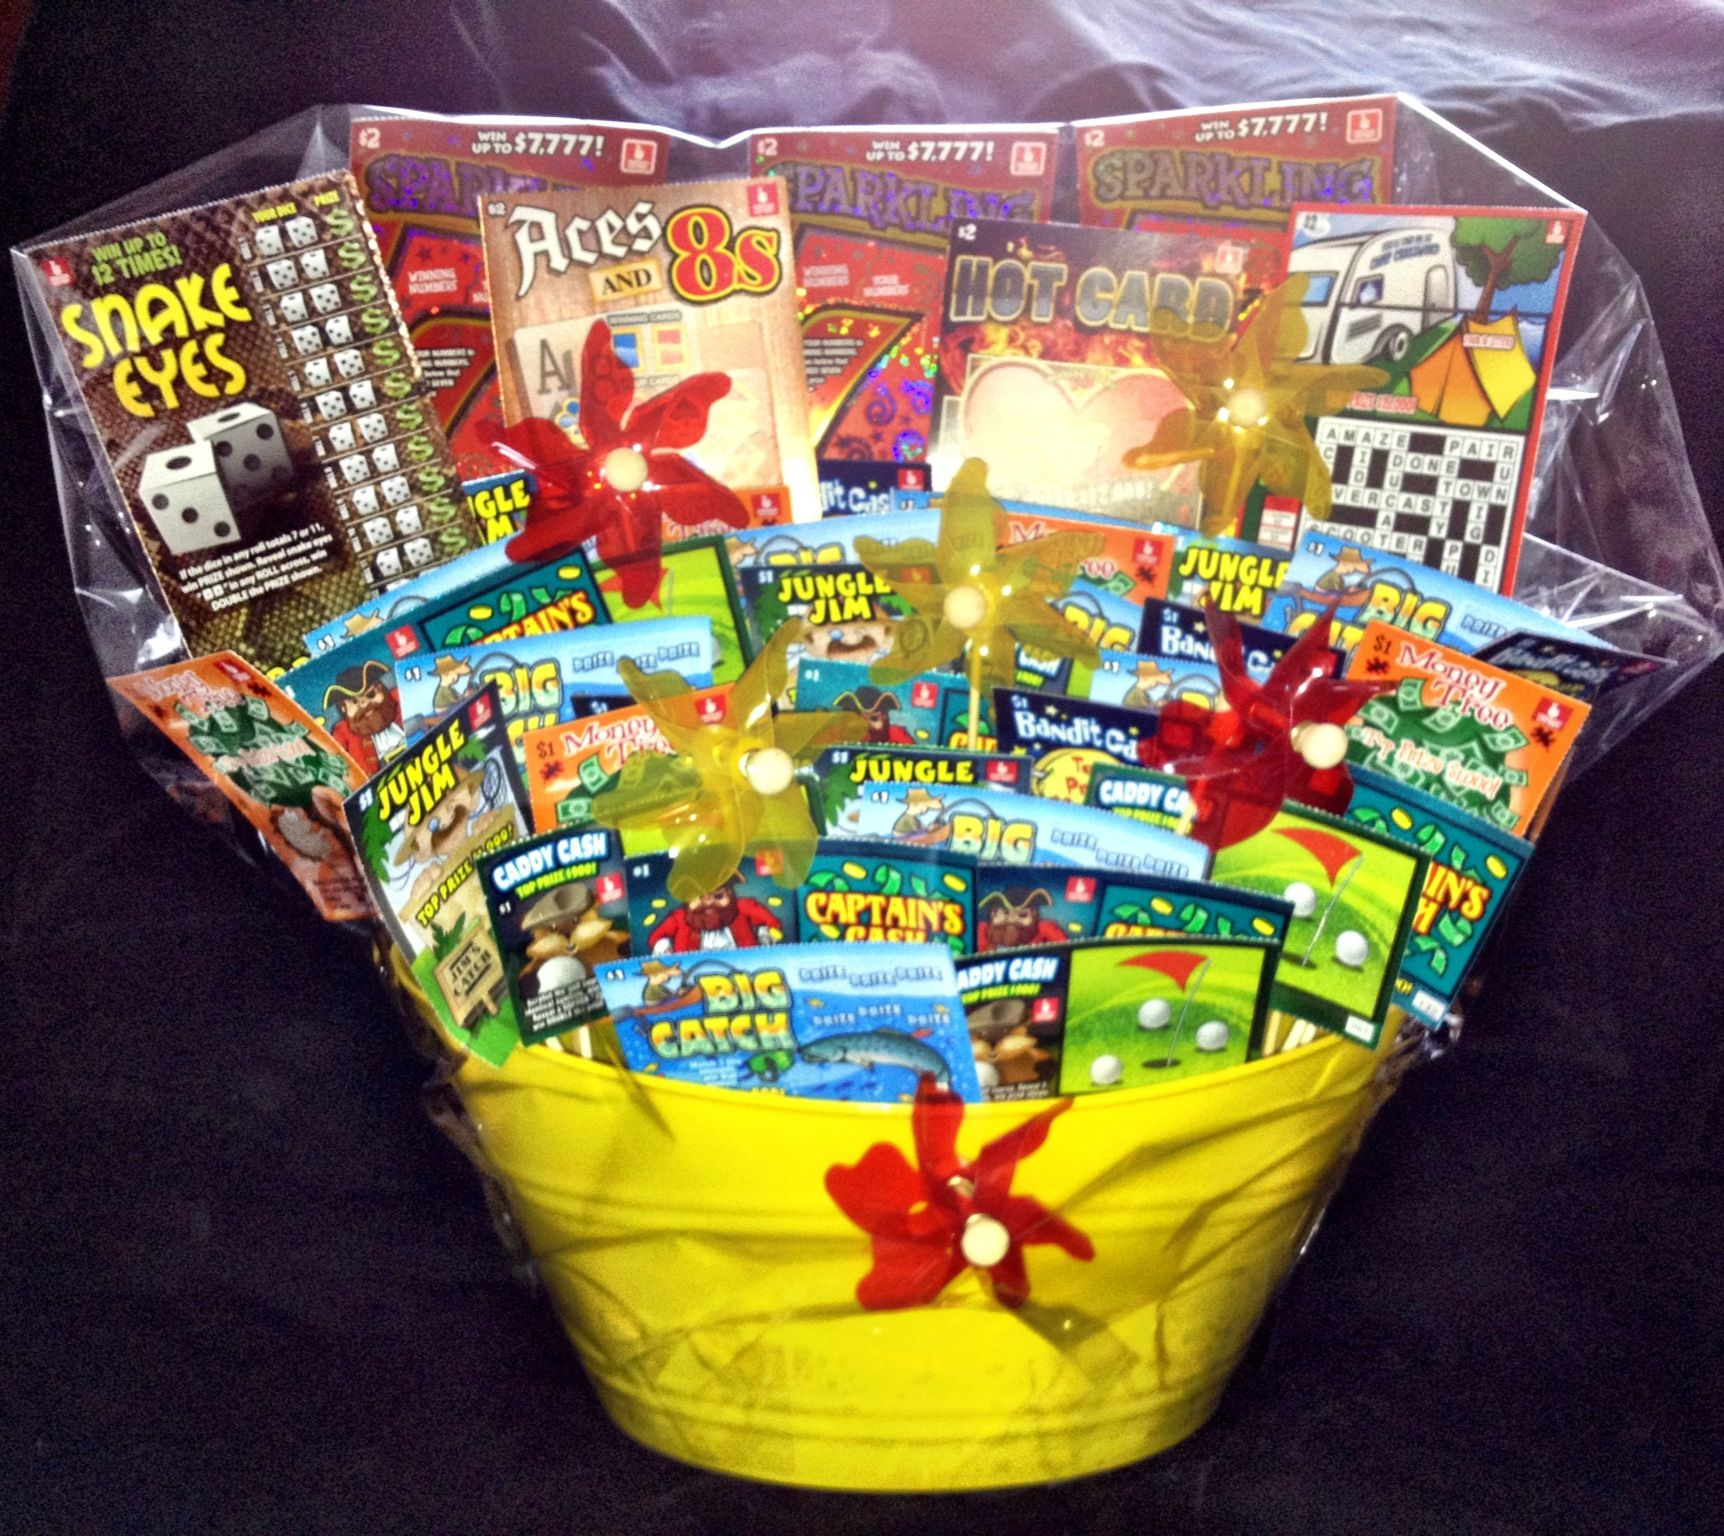 Lottery Is A Good Idea - Lottery ticket basket